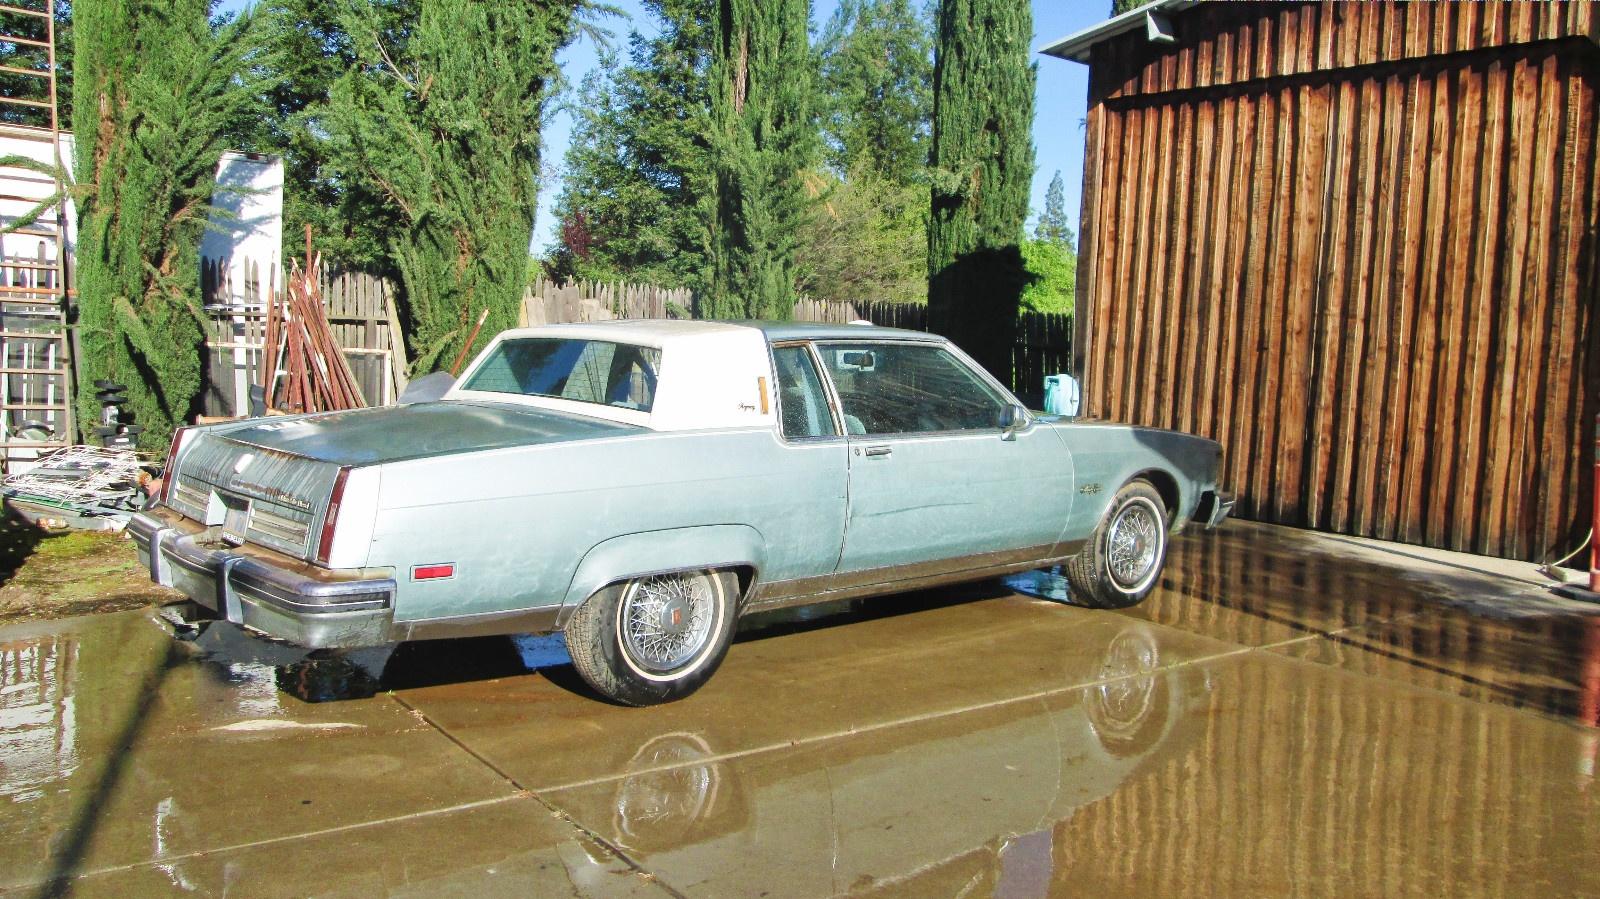 EXCLUSIVE: 1982 Oldsmobile 98 Regency